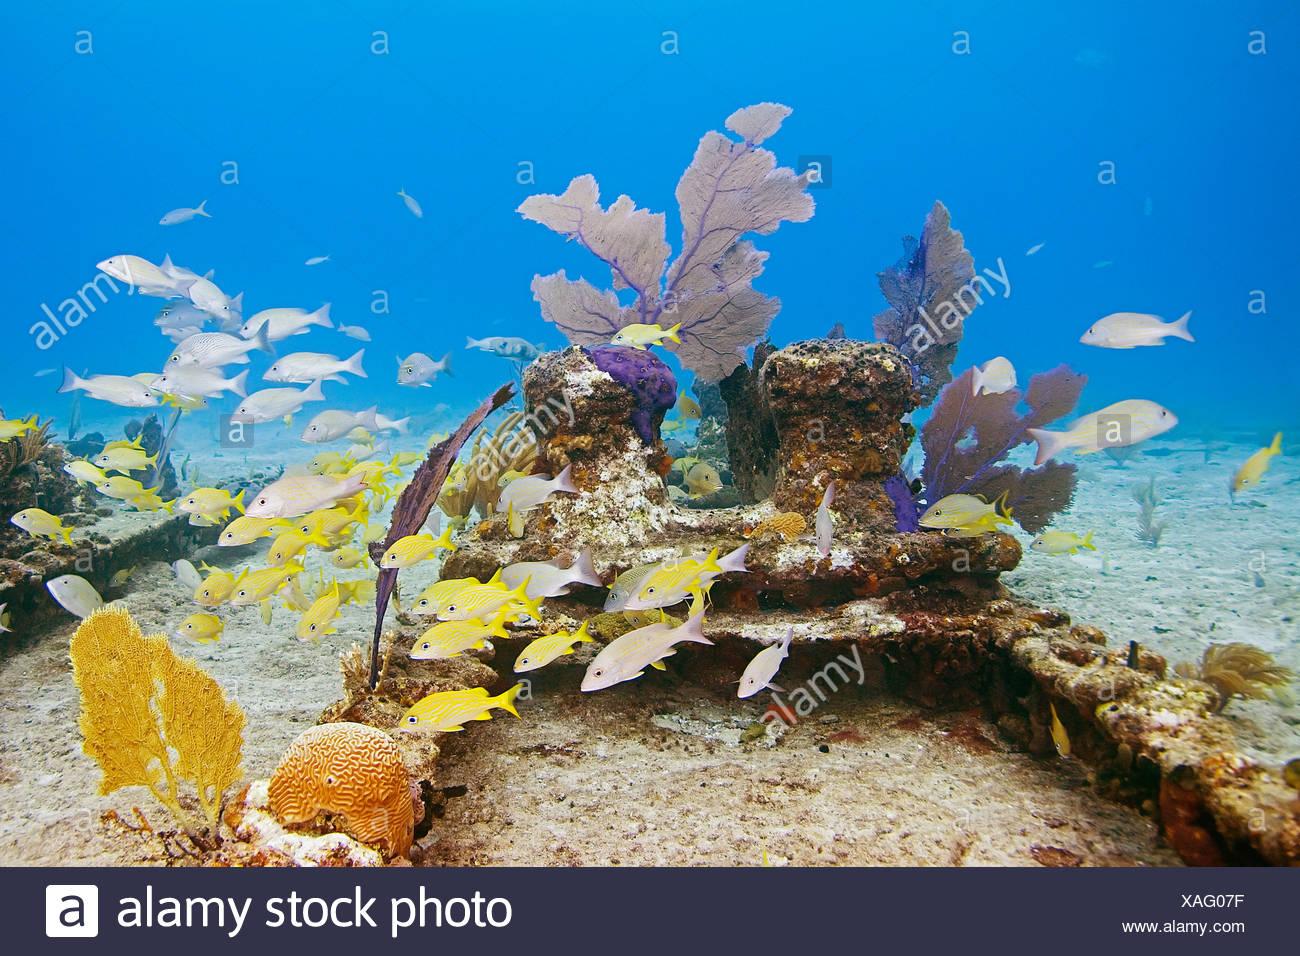 Sea Rods Coral Stockfotos & Sea Rods Coral Bilder - Alamy